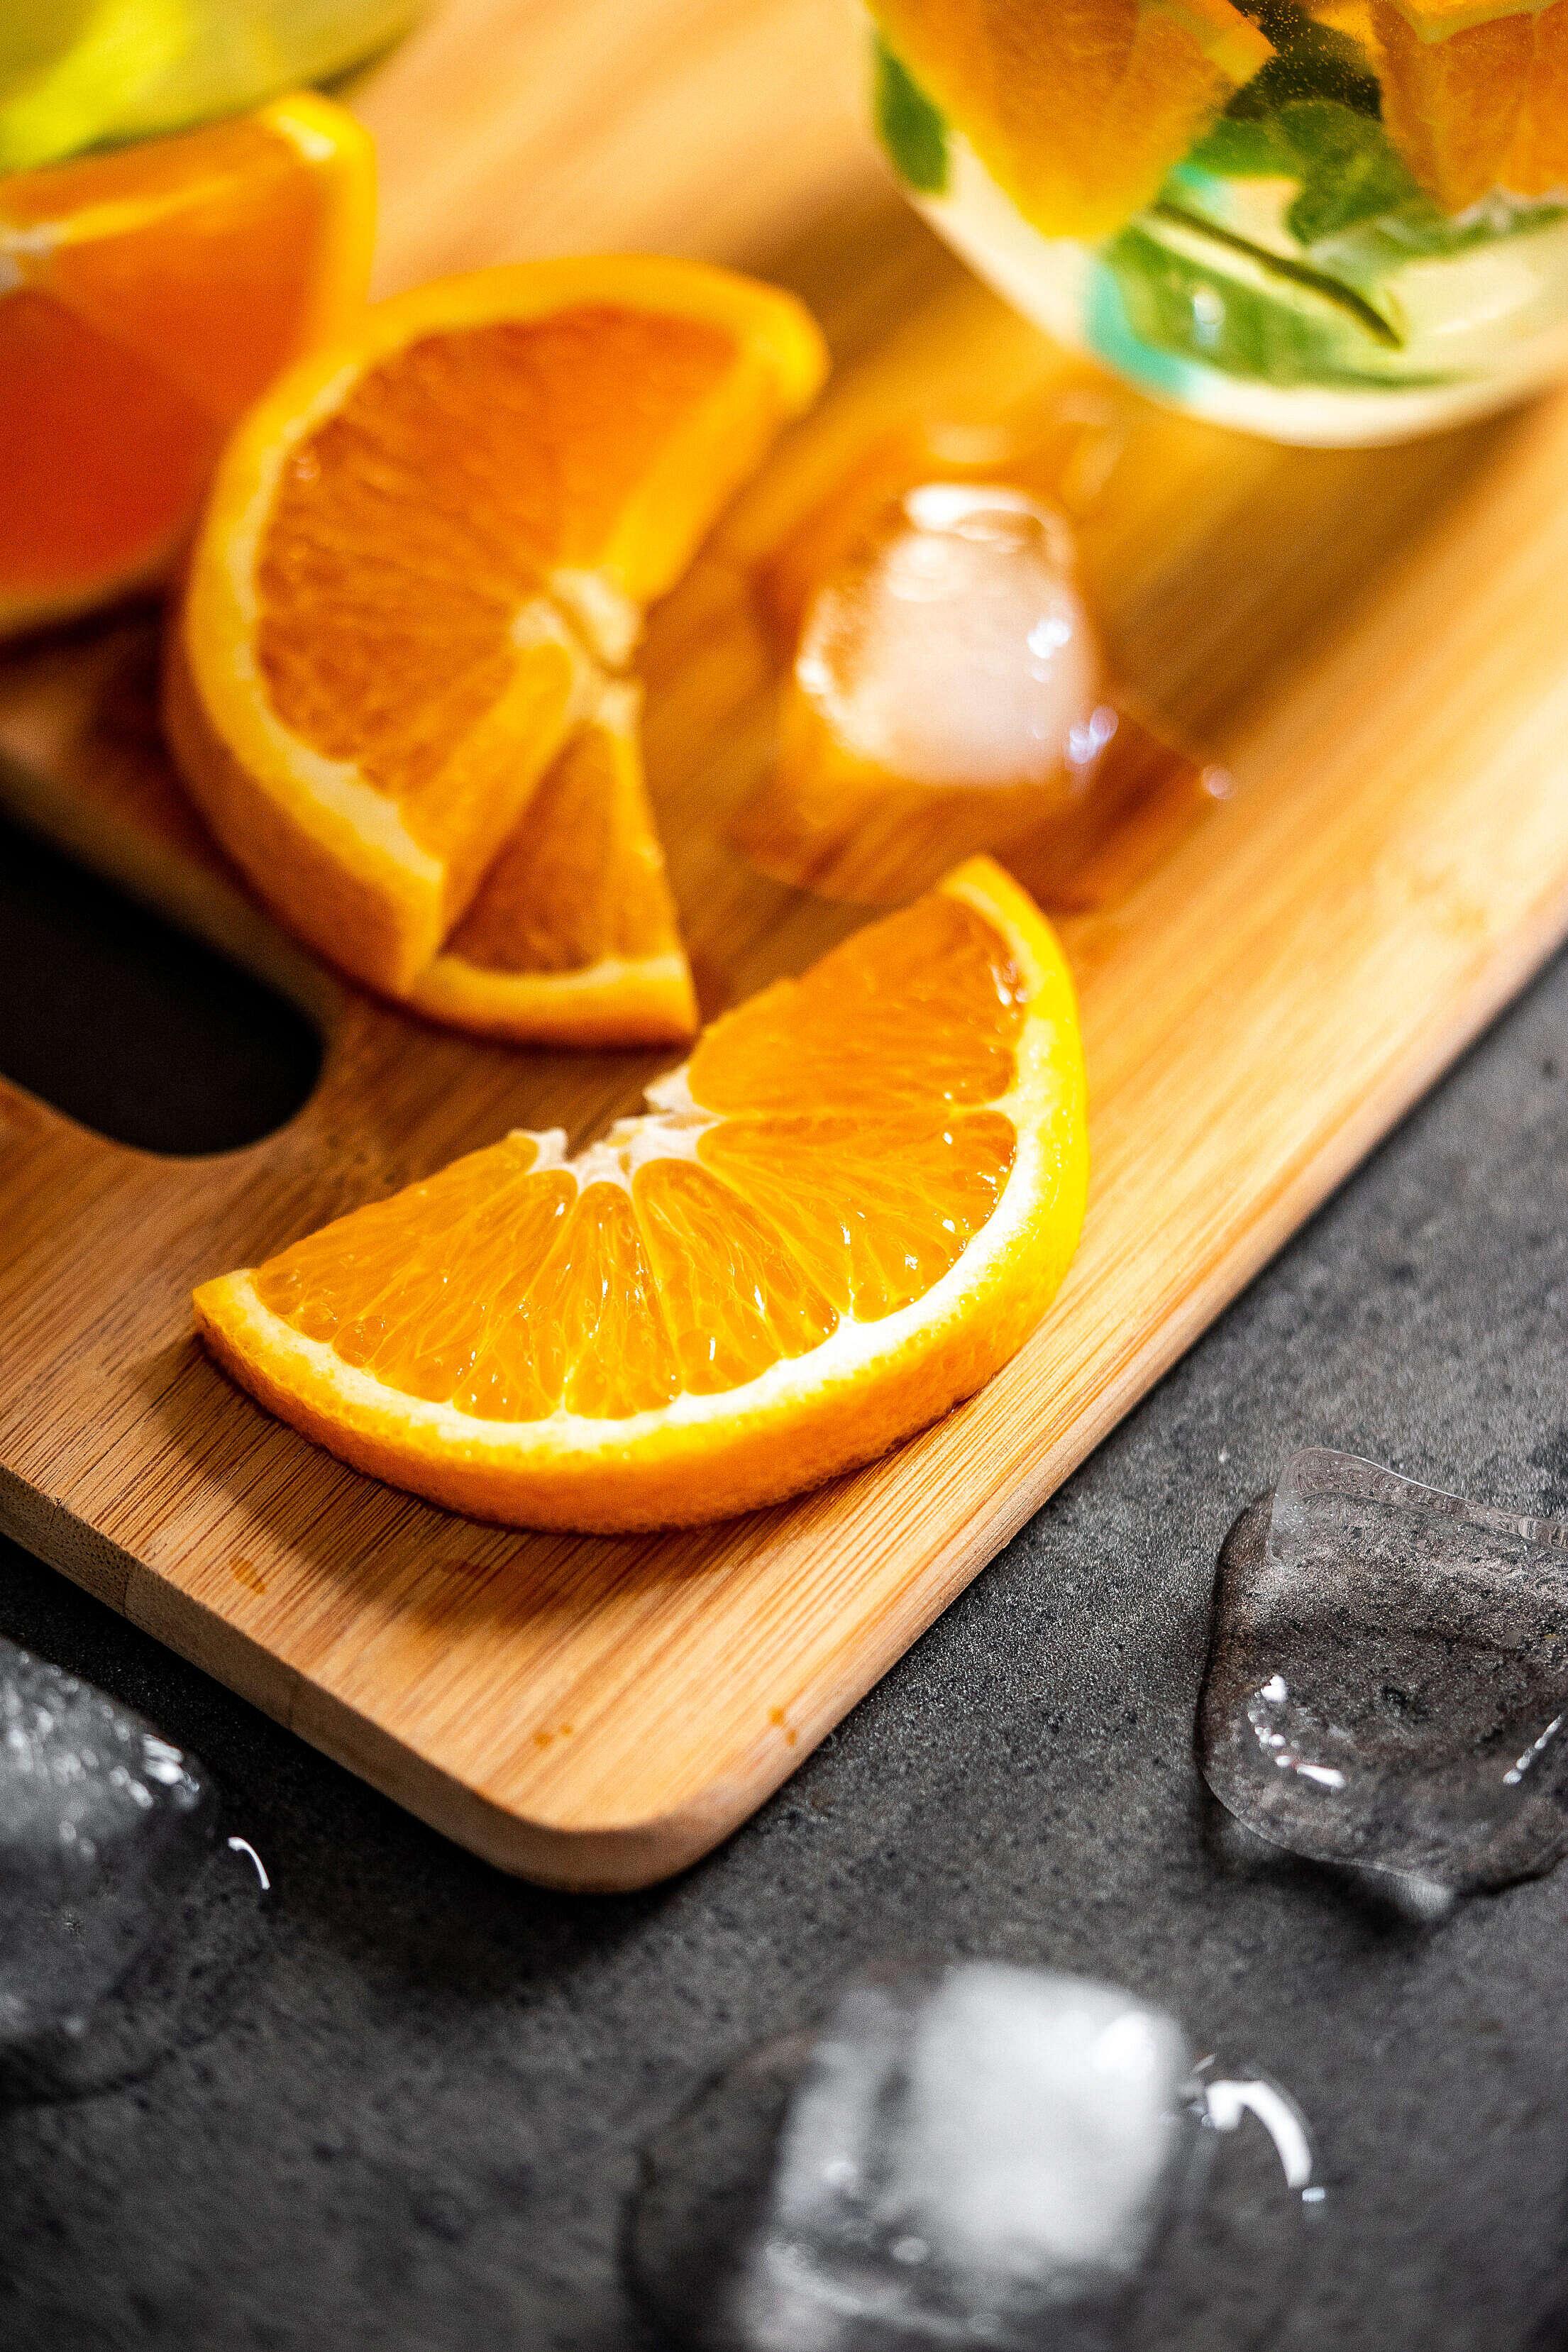 Sliced Orange on The Cutting Board Free Stock Photo